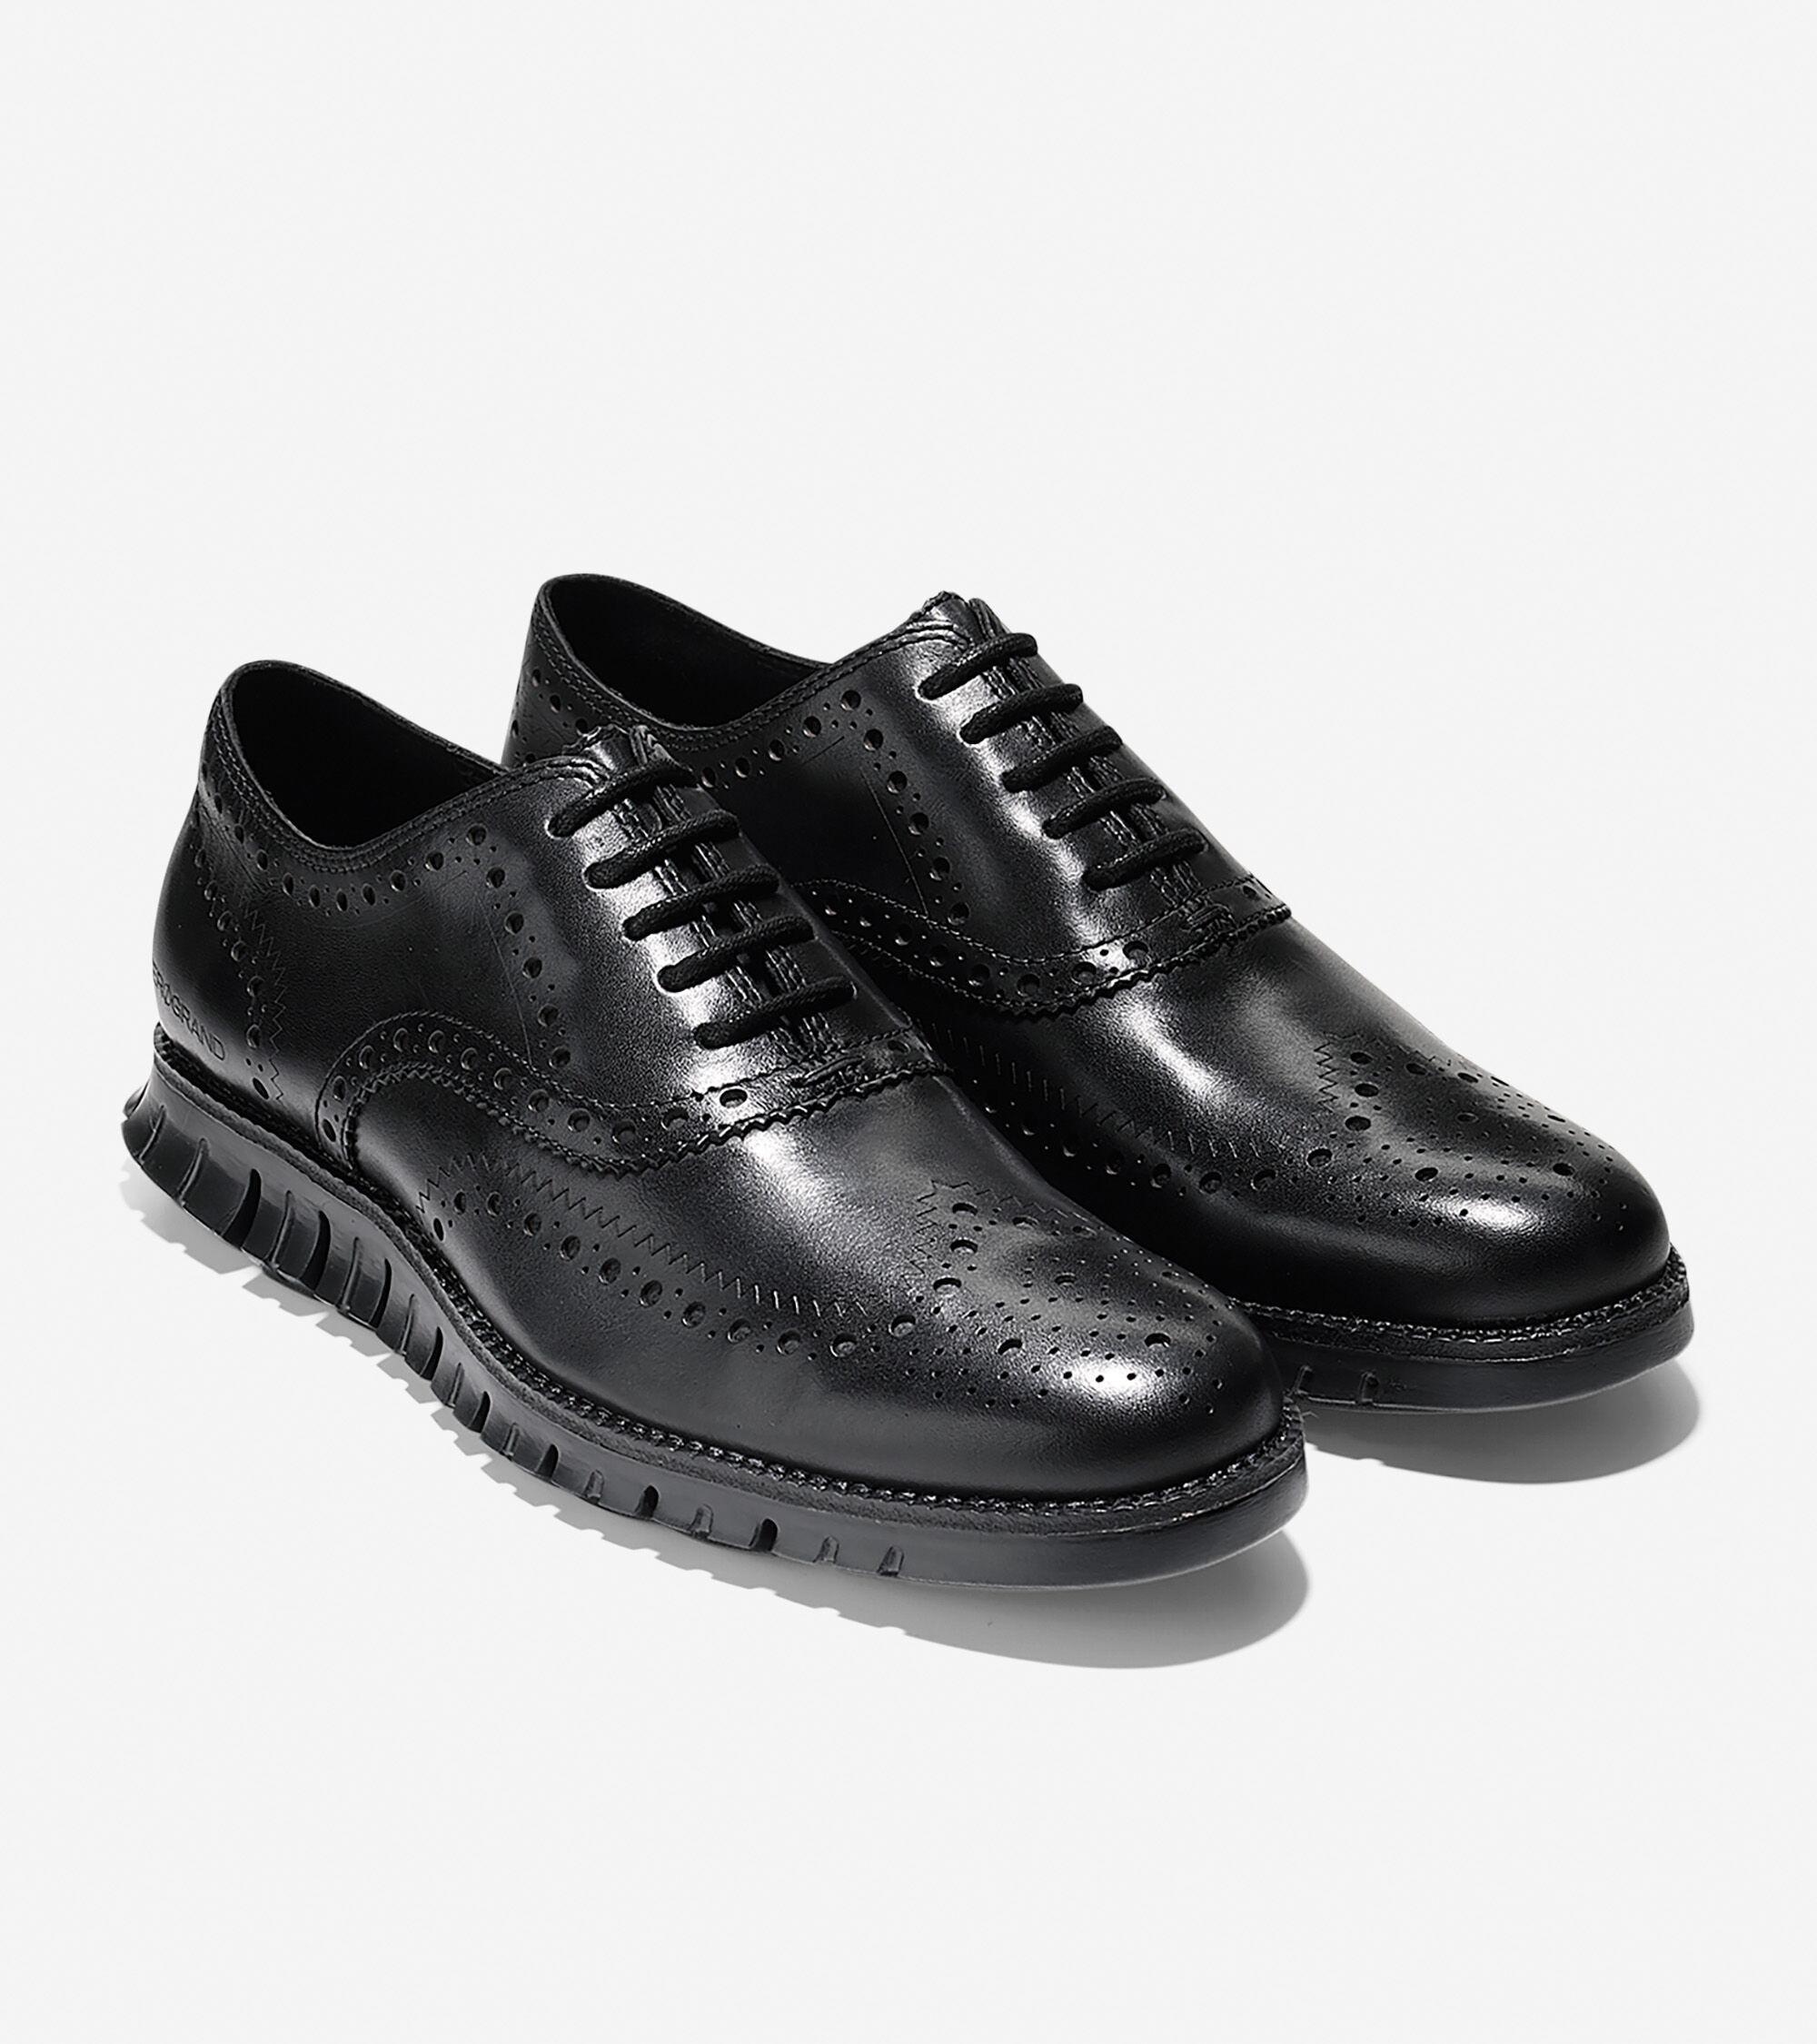 all black oxfords